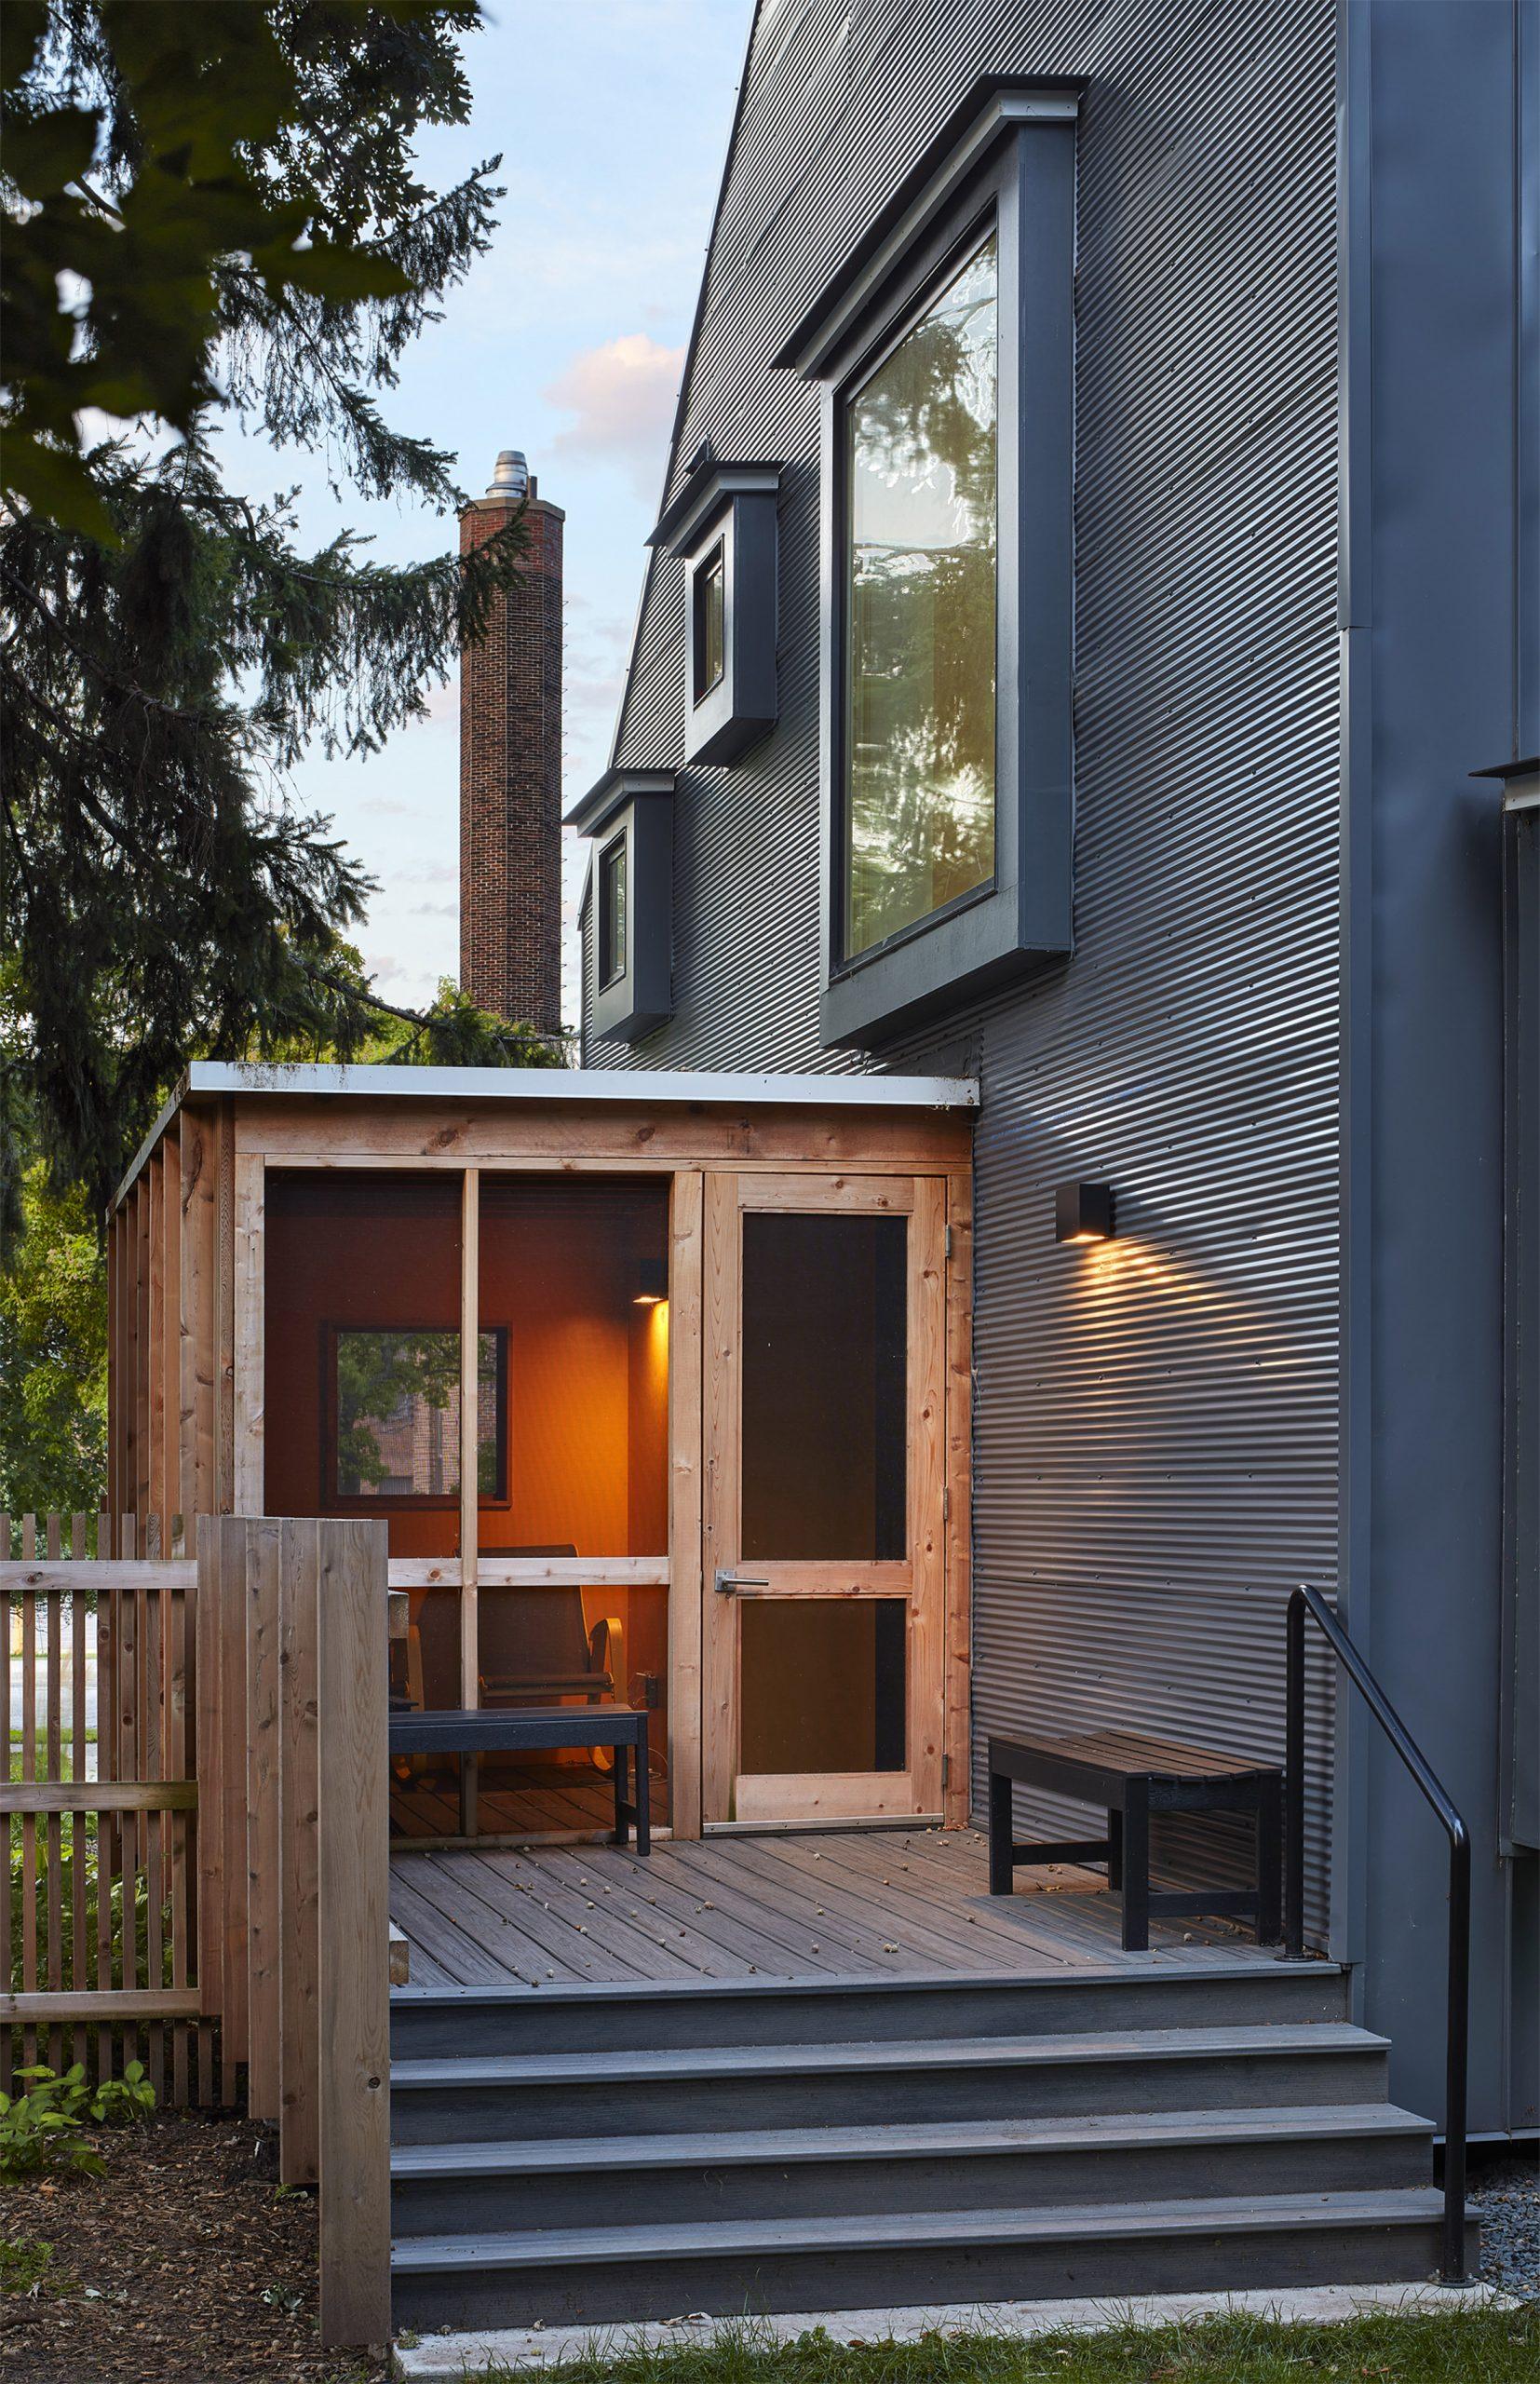 Salmela designed Electric Bungalow in Minnesota